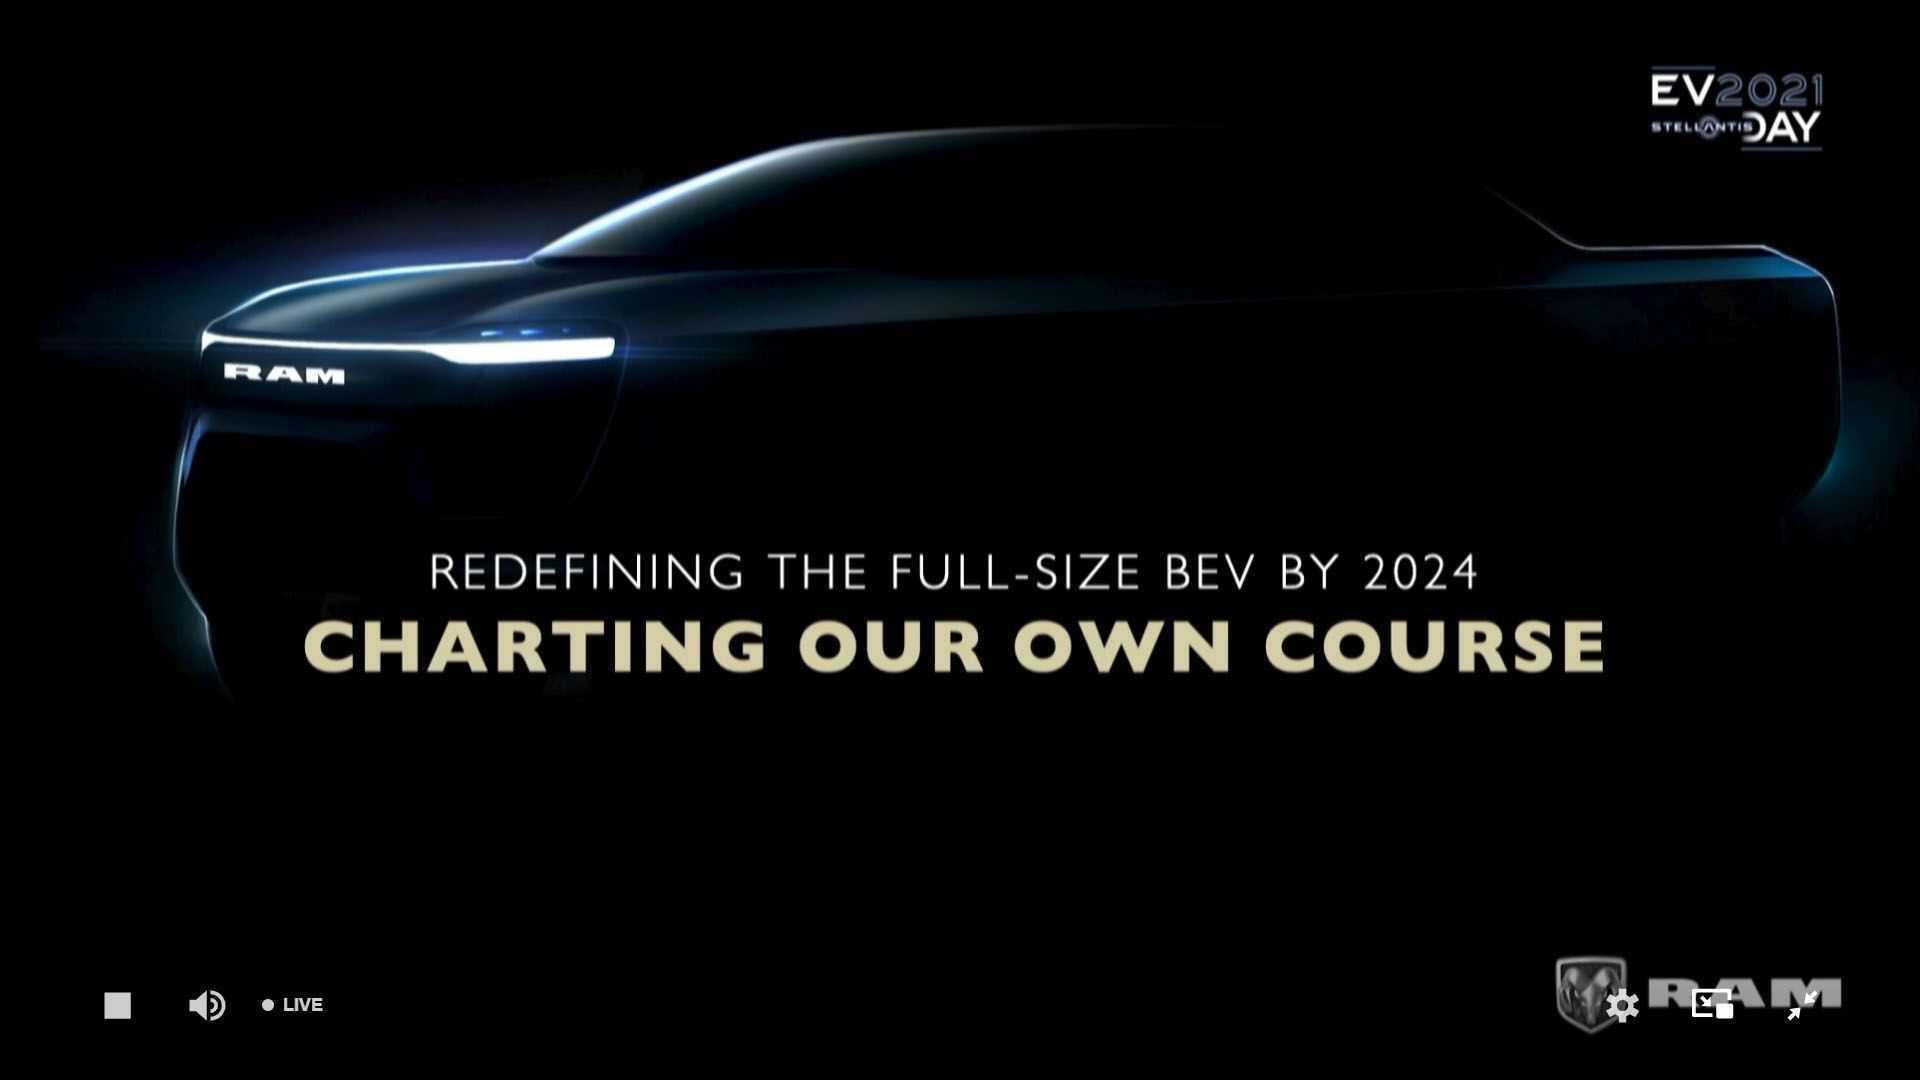 Stellantis EV Dia 2021